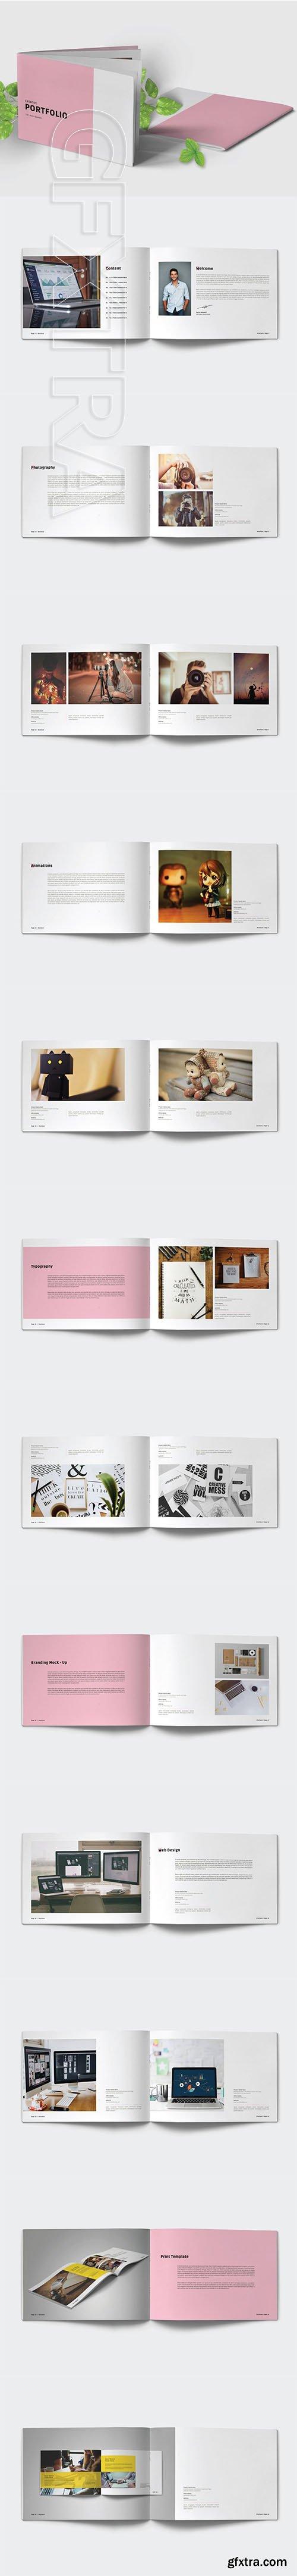 CreativeMarket - Portfolio 2634922